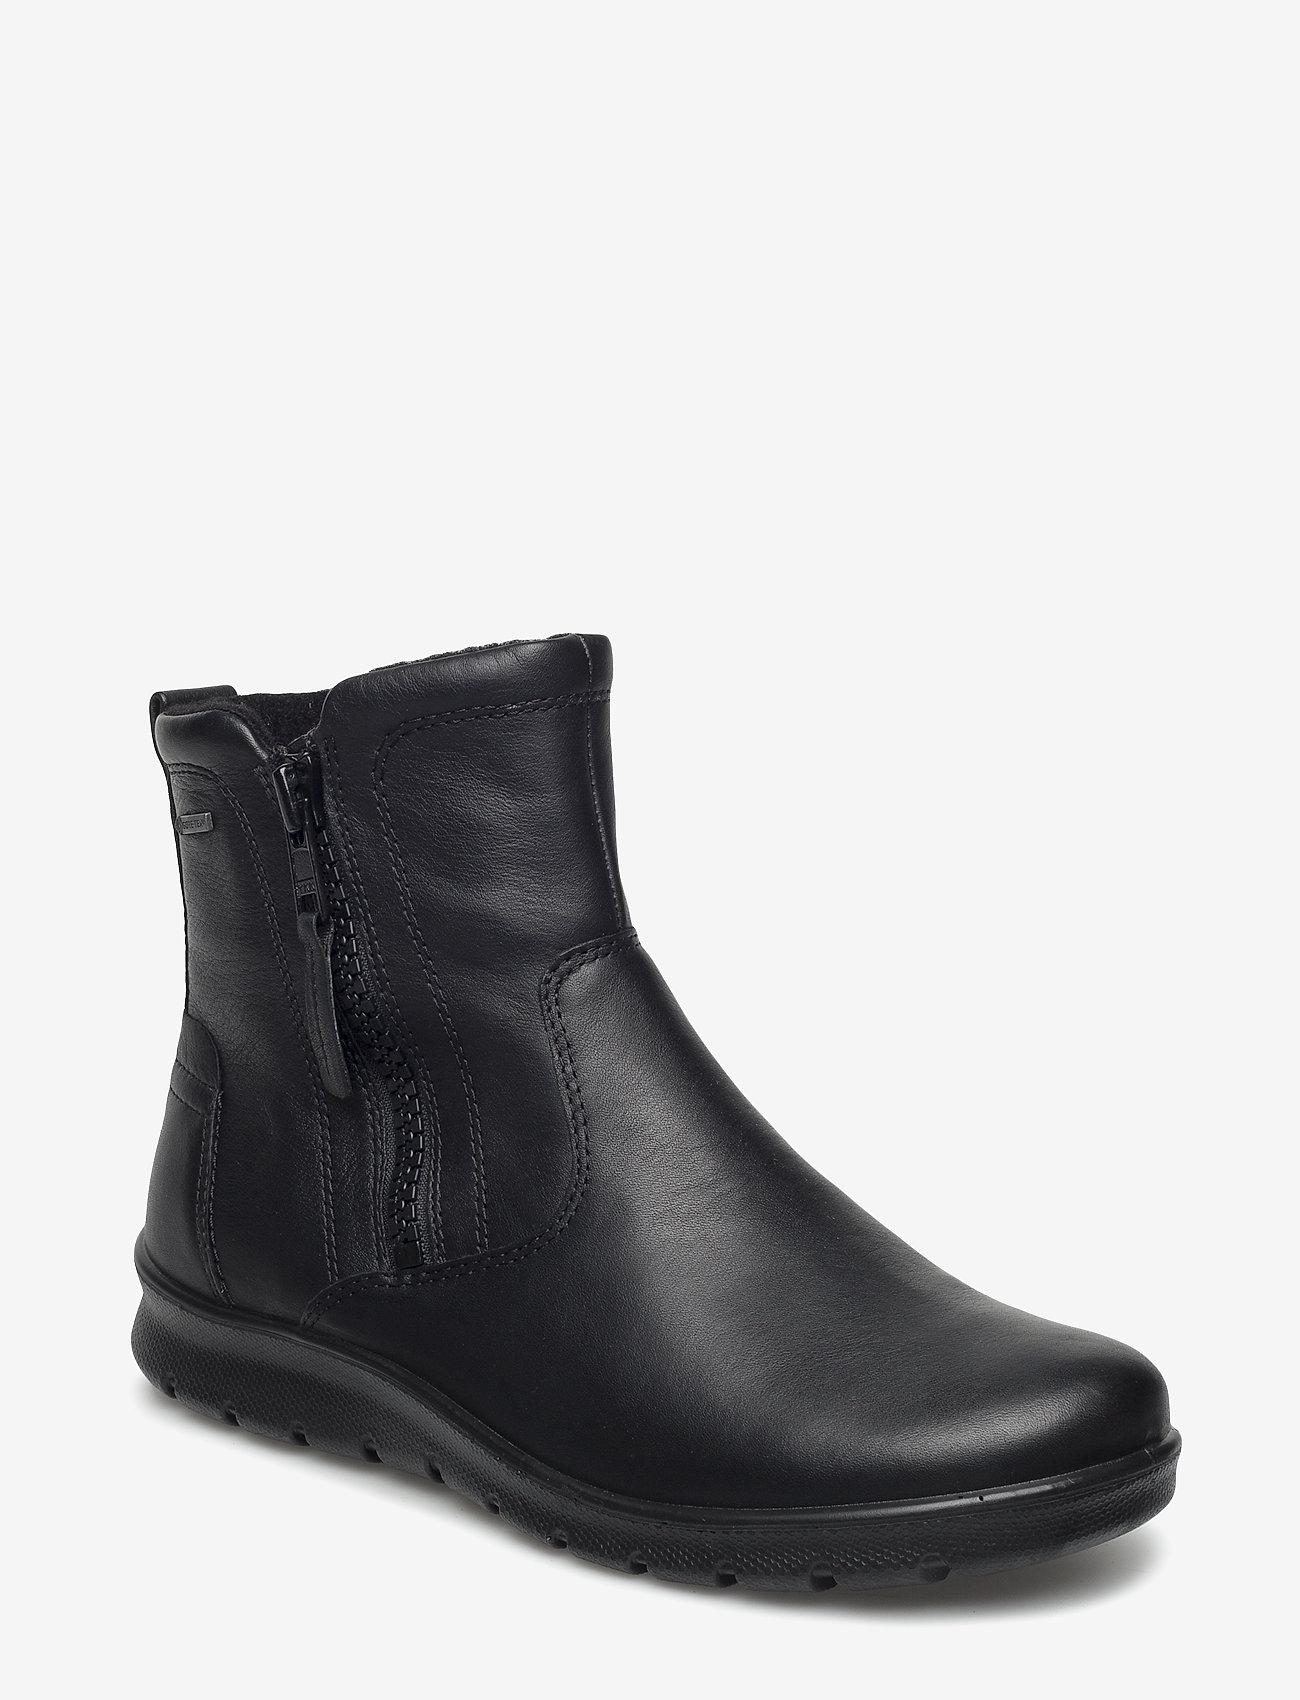 ECCO - BABETT BOOT - flade ankelstøvler - black - 0